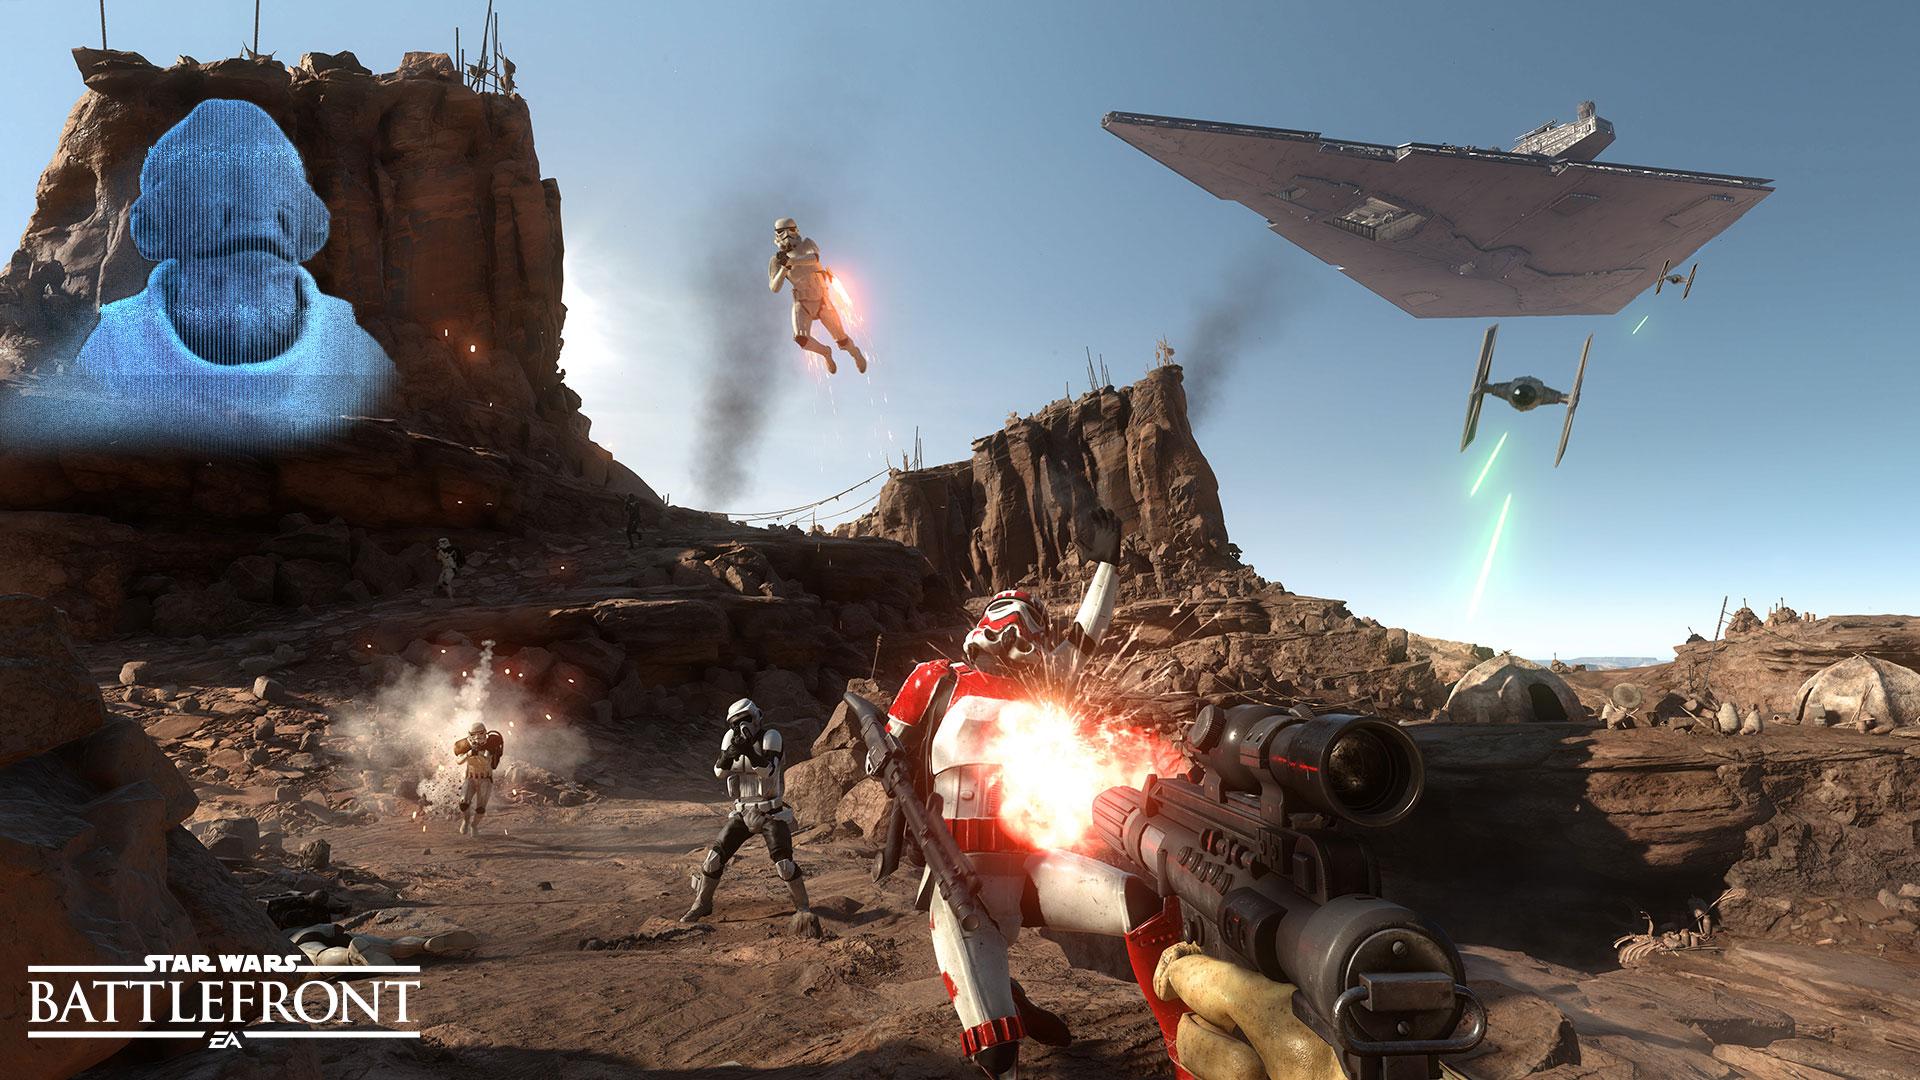 La batalla de Jakku se hace presente en este teaser de Star Wars: Battlefront [TEASER]